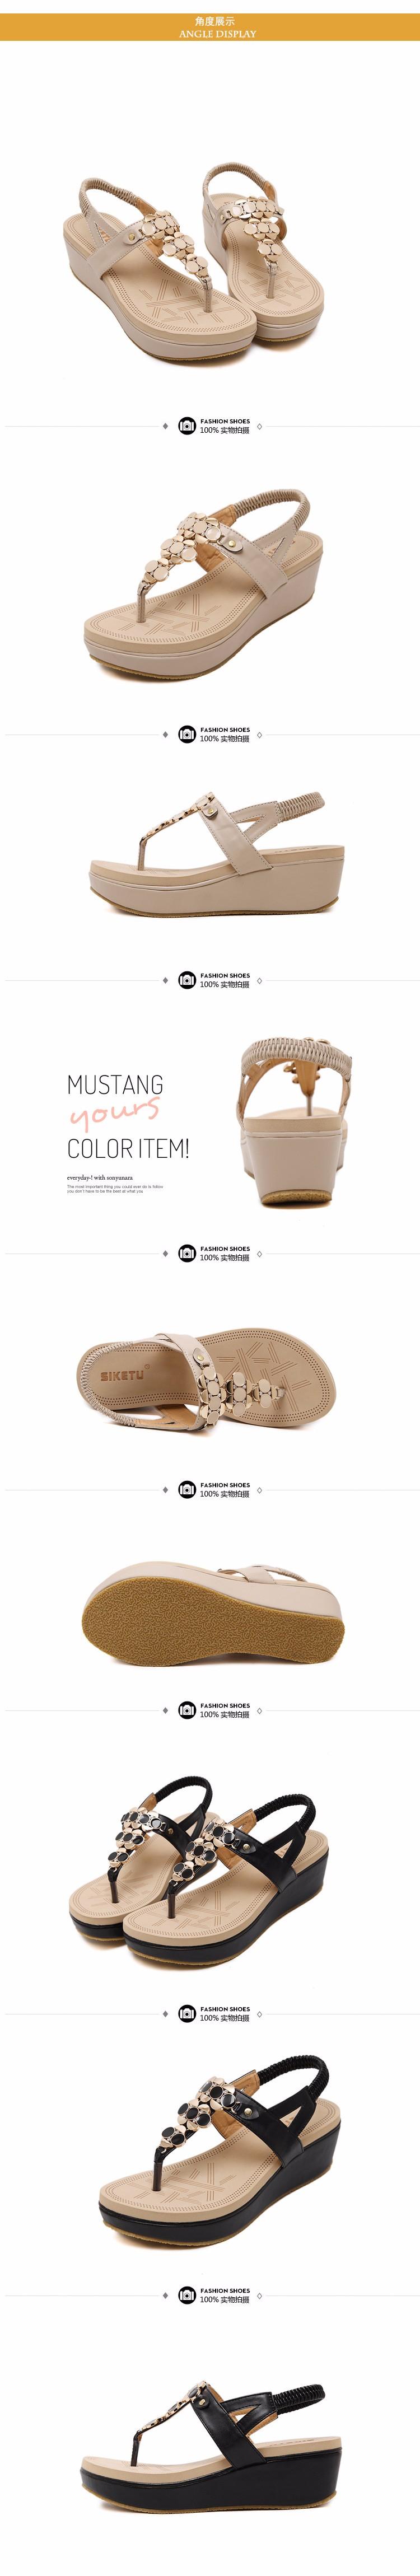 New 2016 Women sandal women summer wedge shoes woman sandalias platform sandals Thong Beaded Black sandal